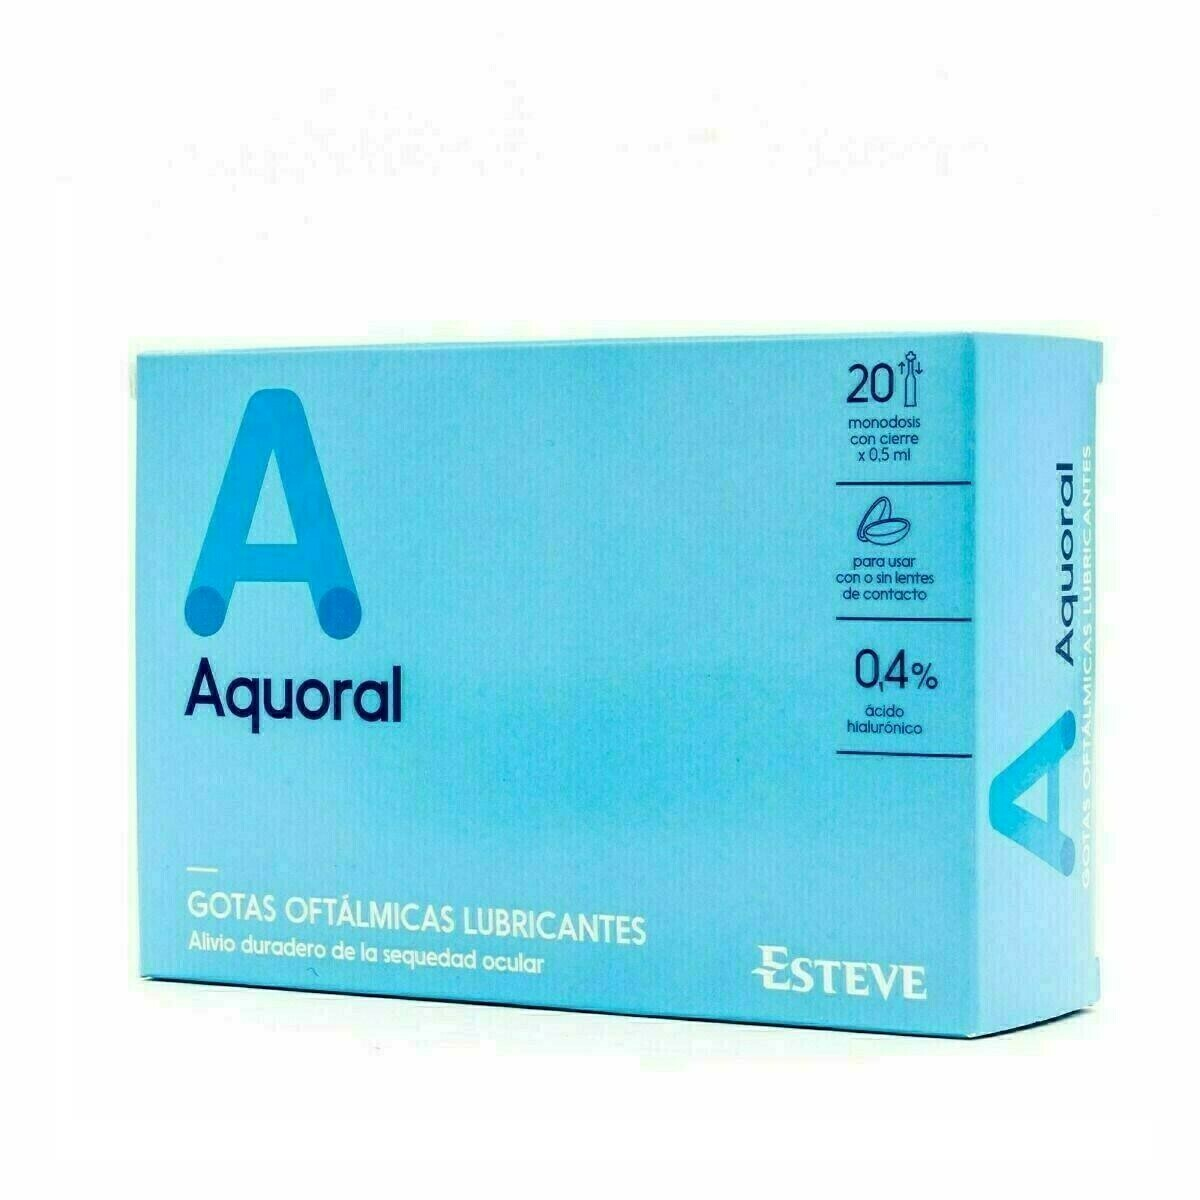 AQUORAL GOTAS HUMECTANTES C/ A HIALURONICO 0.4% 0.5 ML 20 MONODOSIS